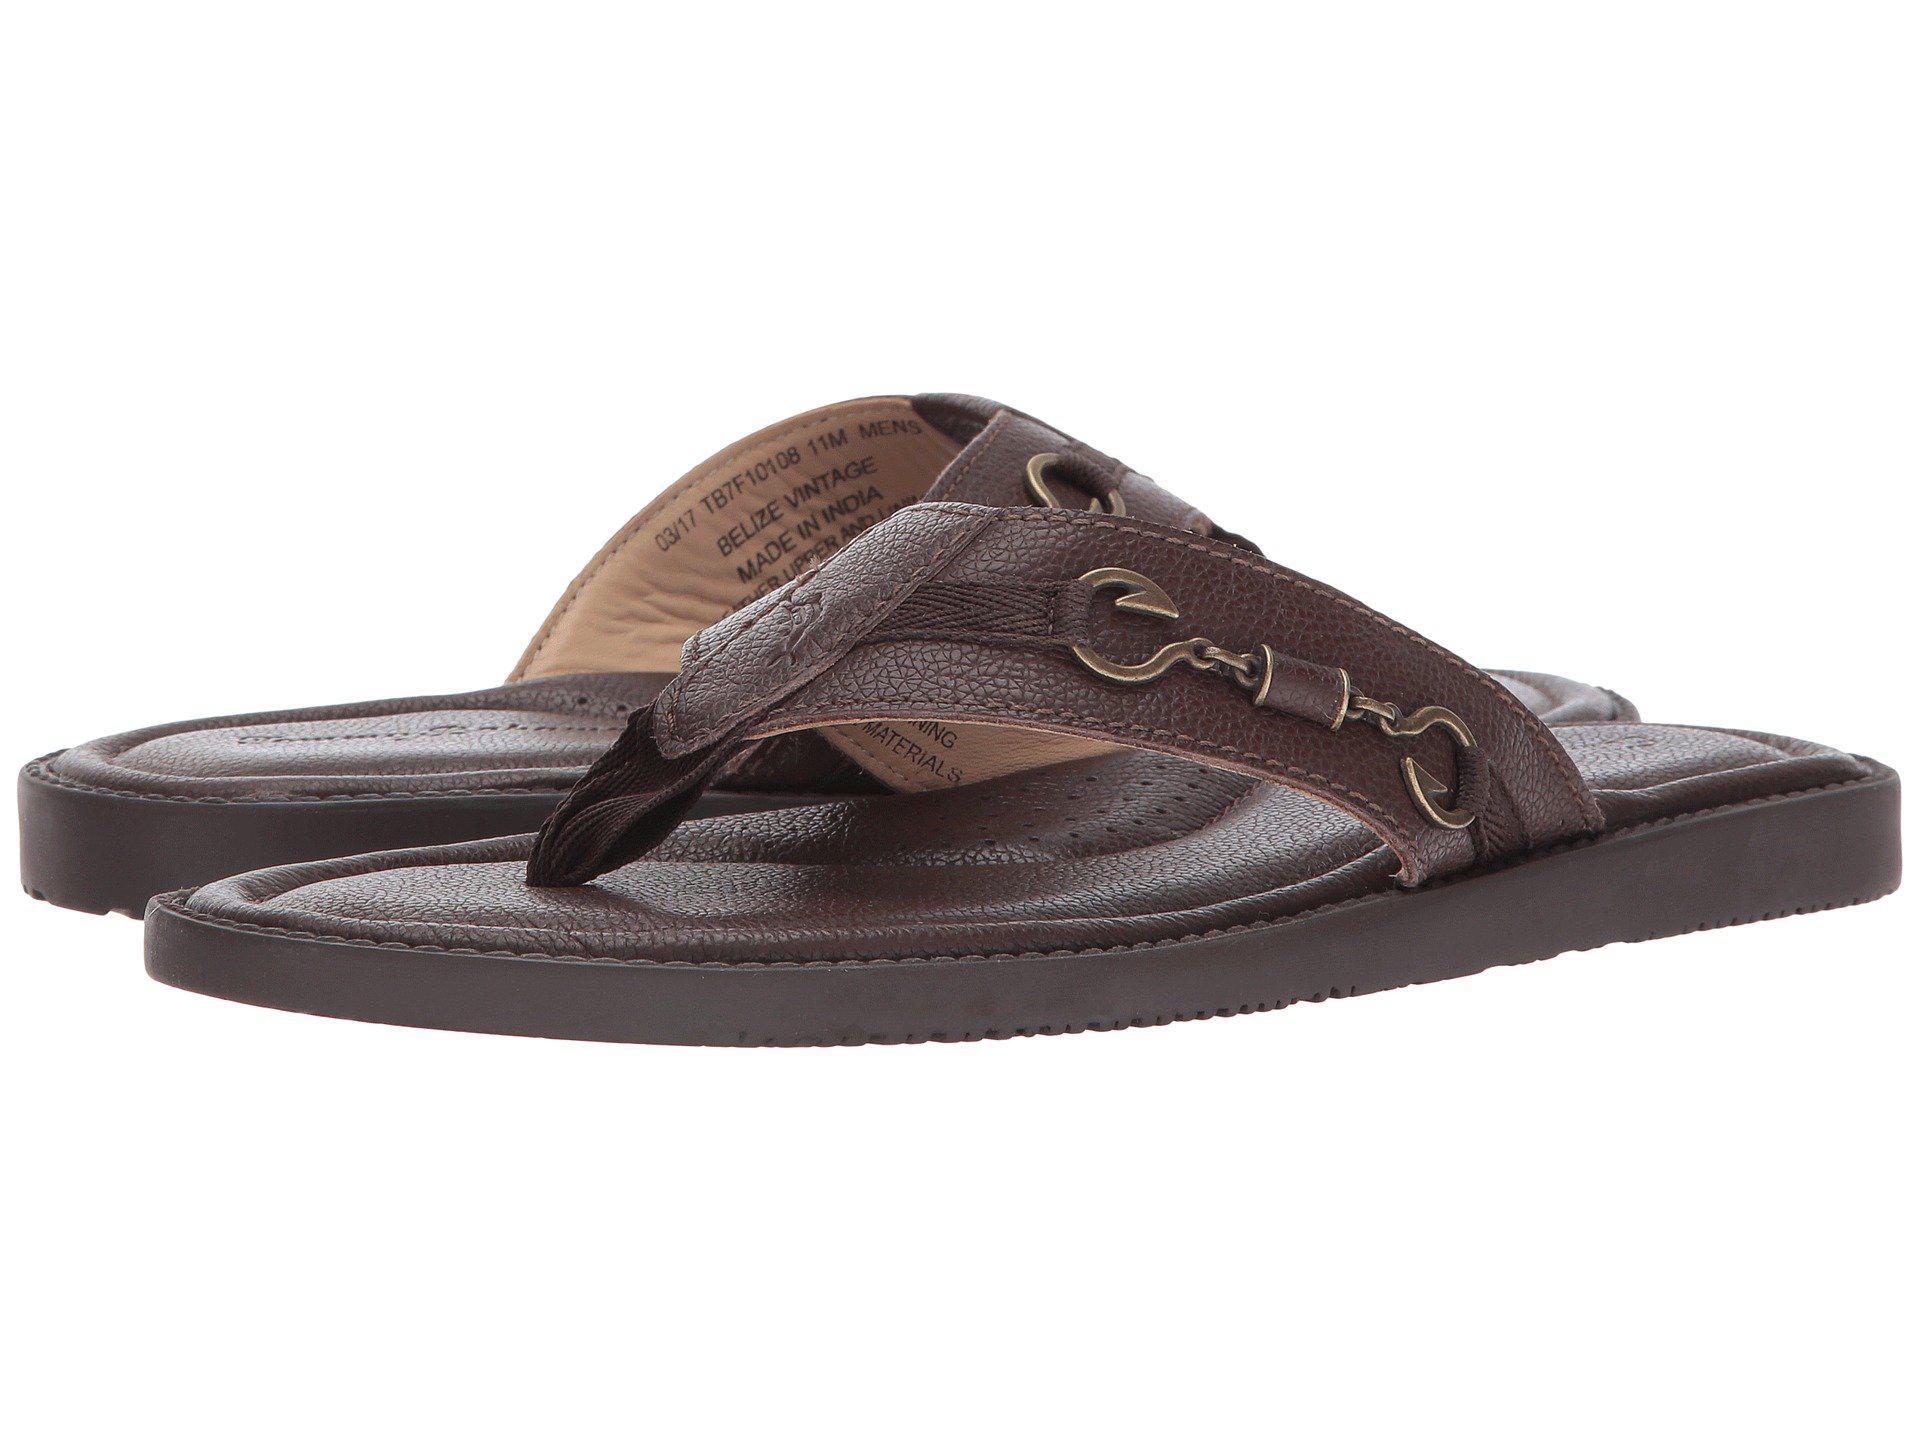 d2aa041dc5259 Lyst - Tommy Bahama Belize Vintage (black) Men s Sandals in Brown ...